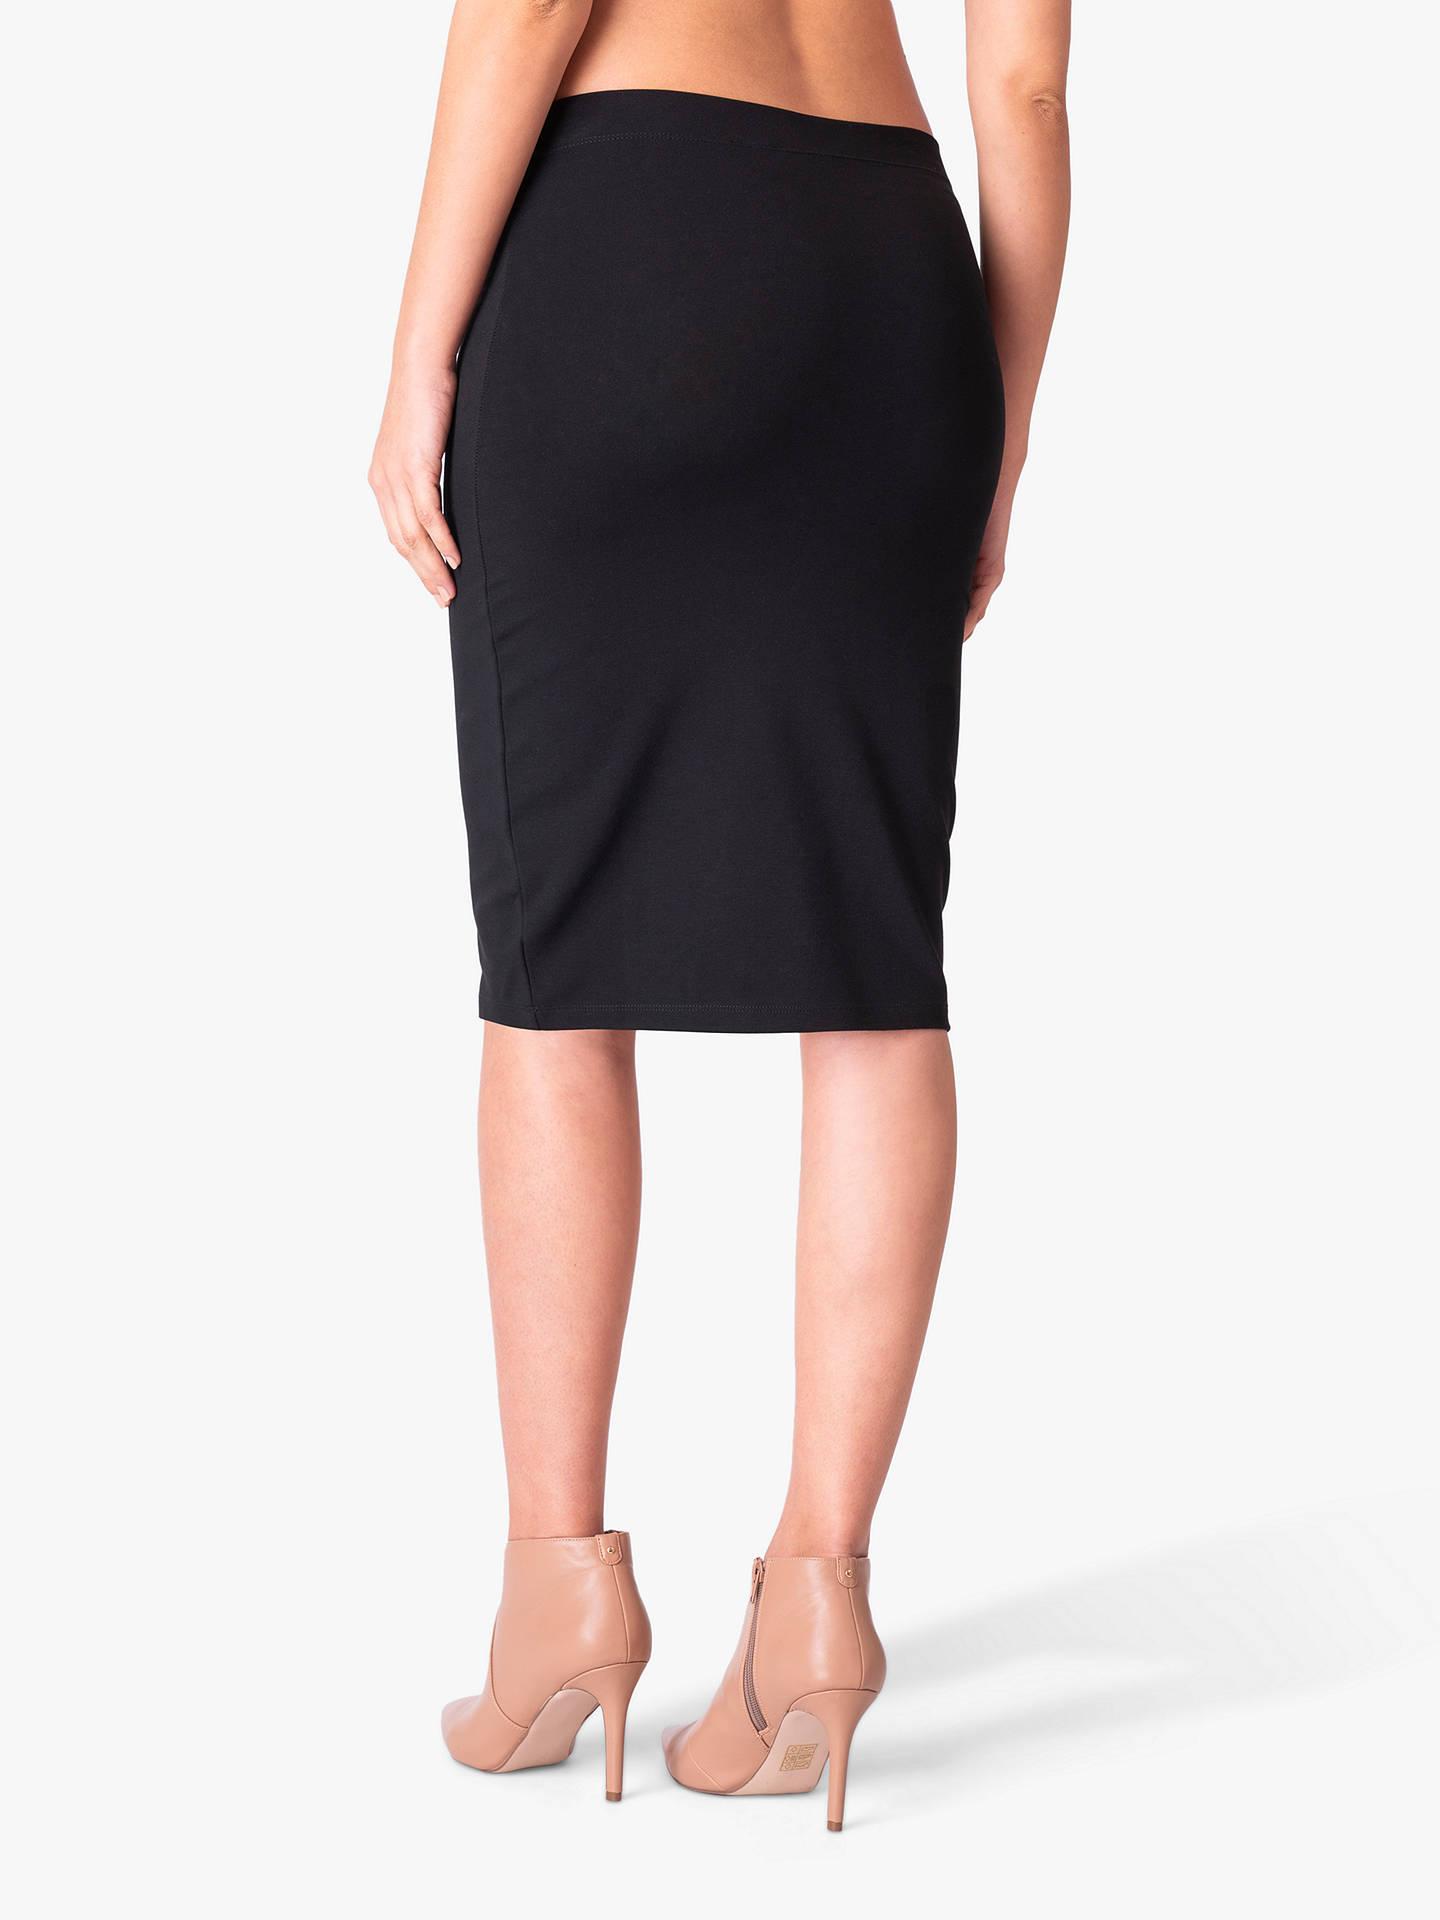 28aab56eda241 Buy Séraphine Cathy Bodycon Maternity Pencil Skirt, Black, S Online at  johnlewis.com ...